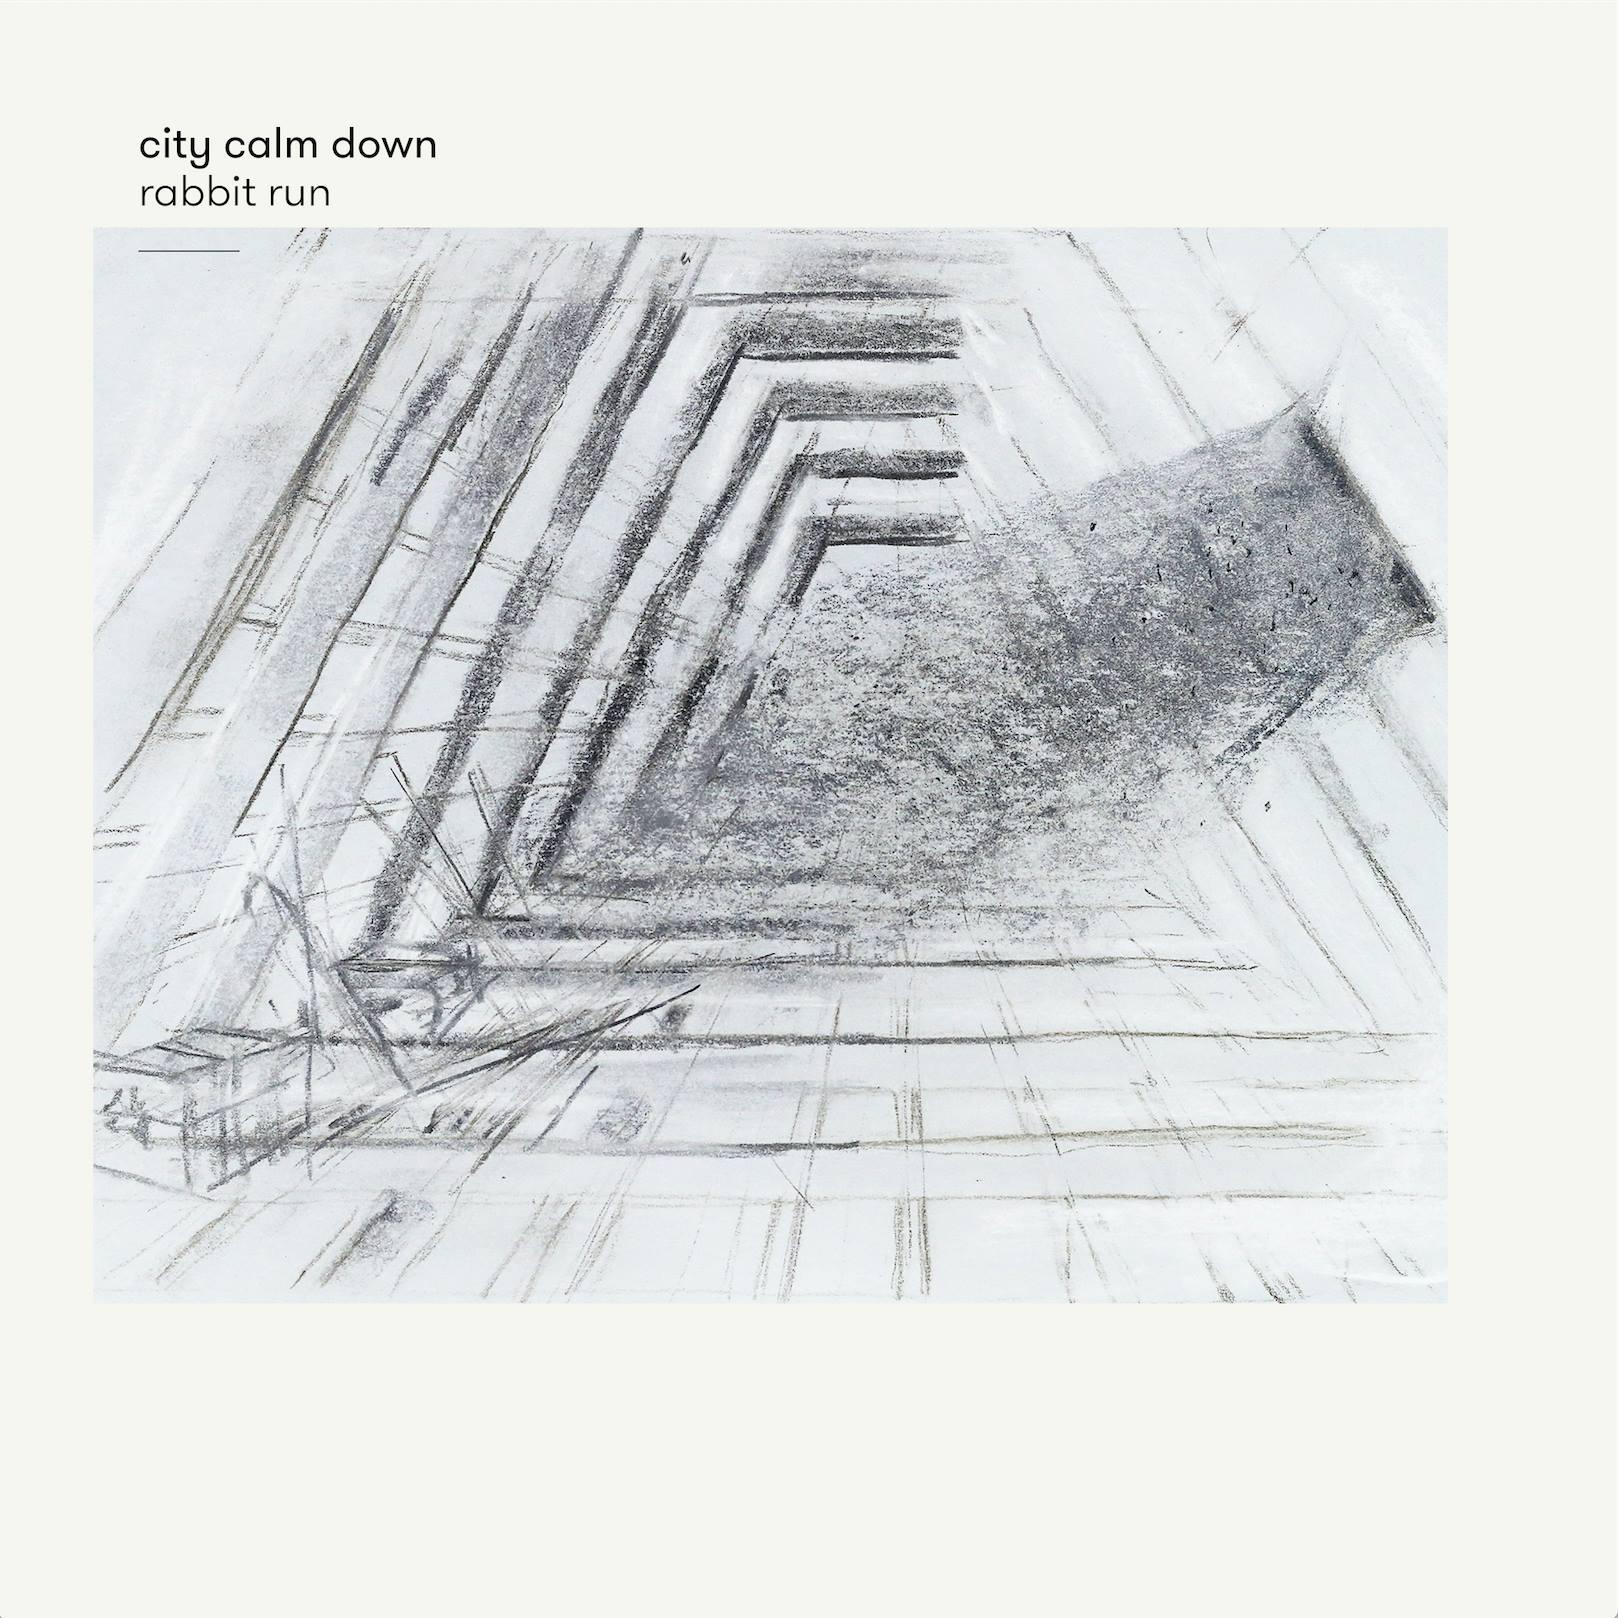 City Calm Down - Rabbit Run